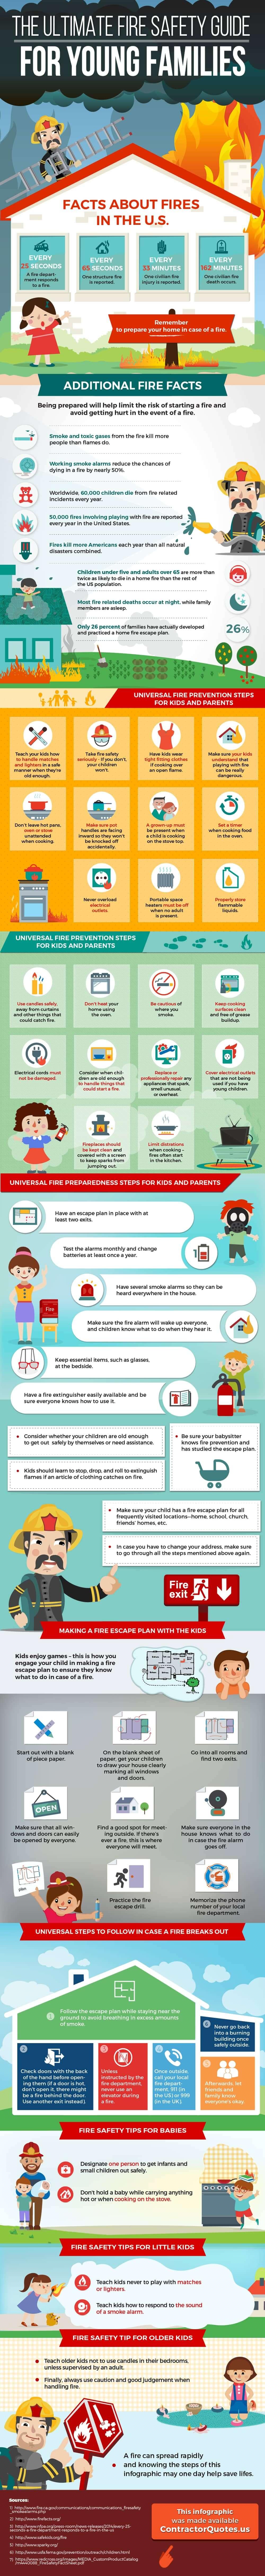 Infografis Panduan Keselamatan Kebakaran Rumah Untuk Keluarga Muda - BeliSewaRumah